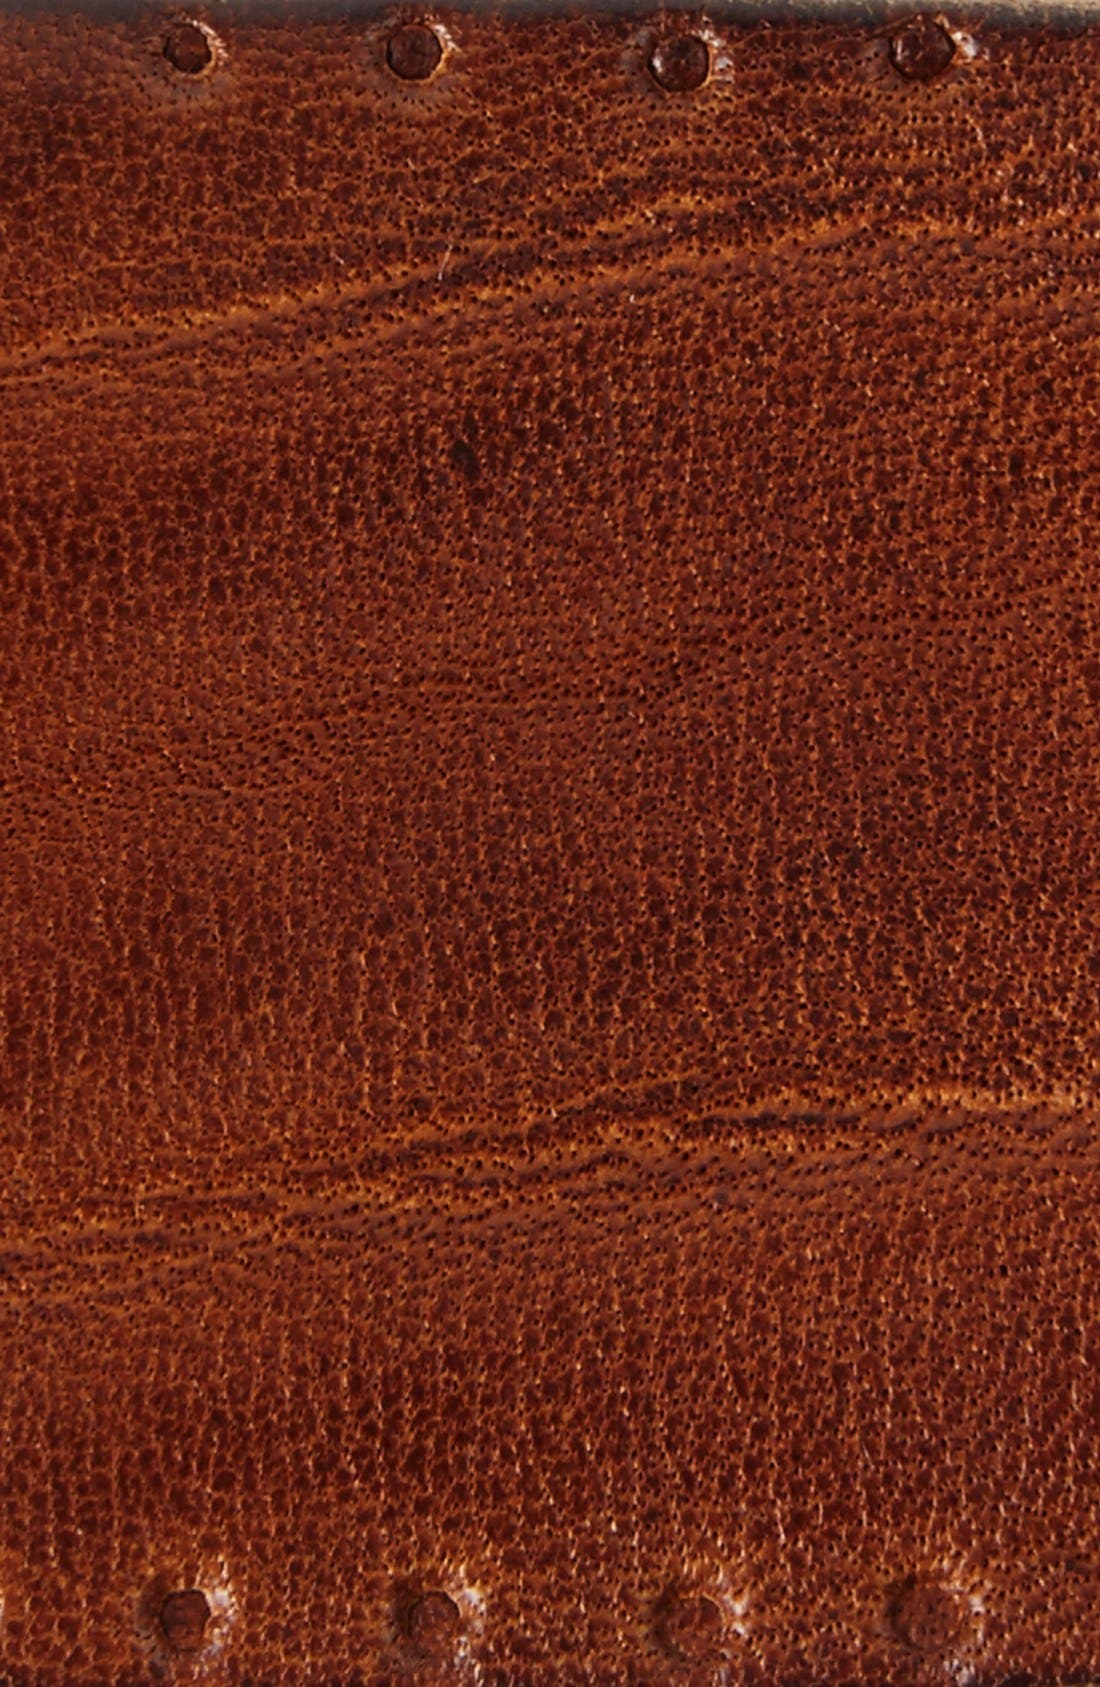 Alternate Image 2  - Trafalgar 'Winslow' Leather Belt